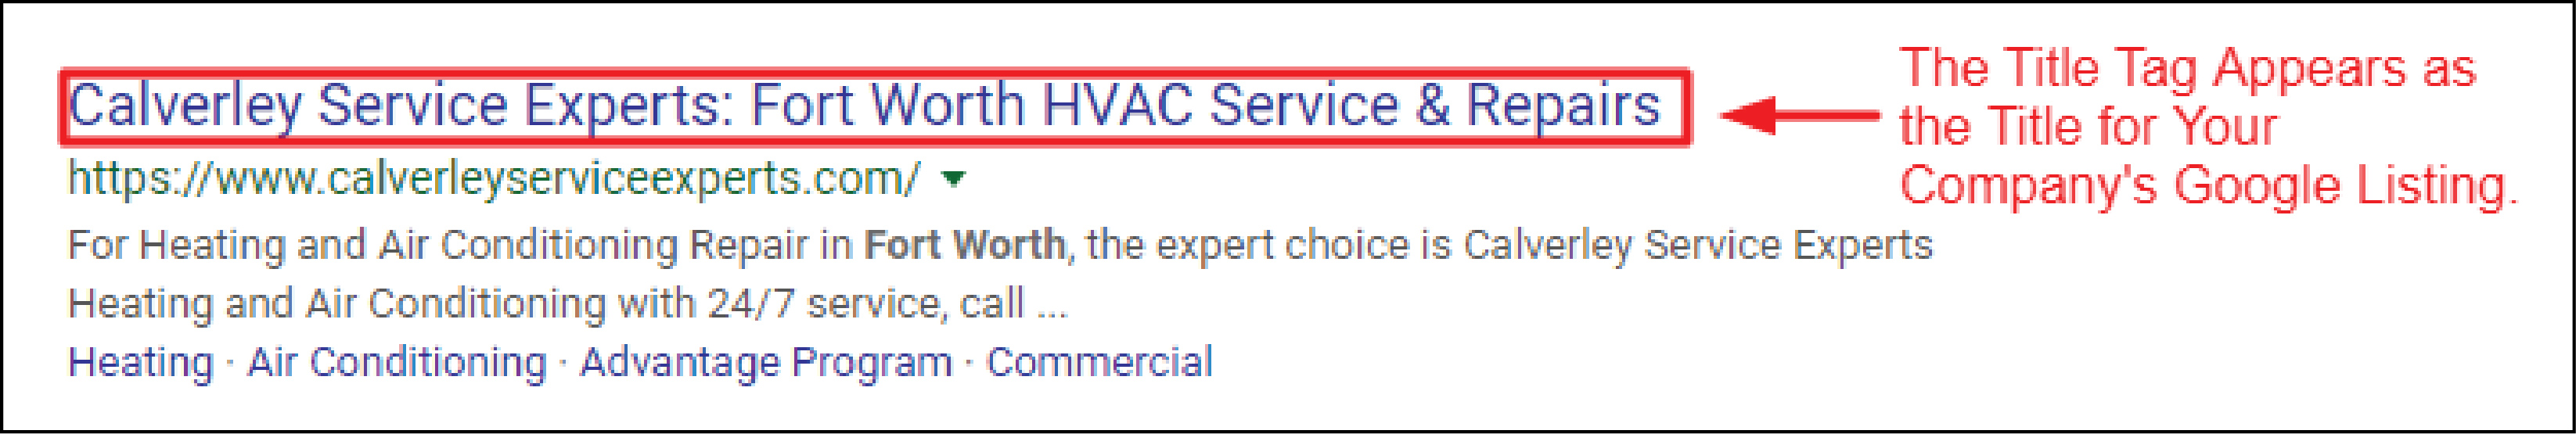 HVAC Title Tag